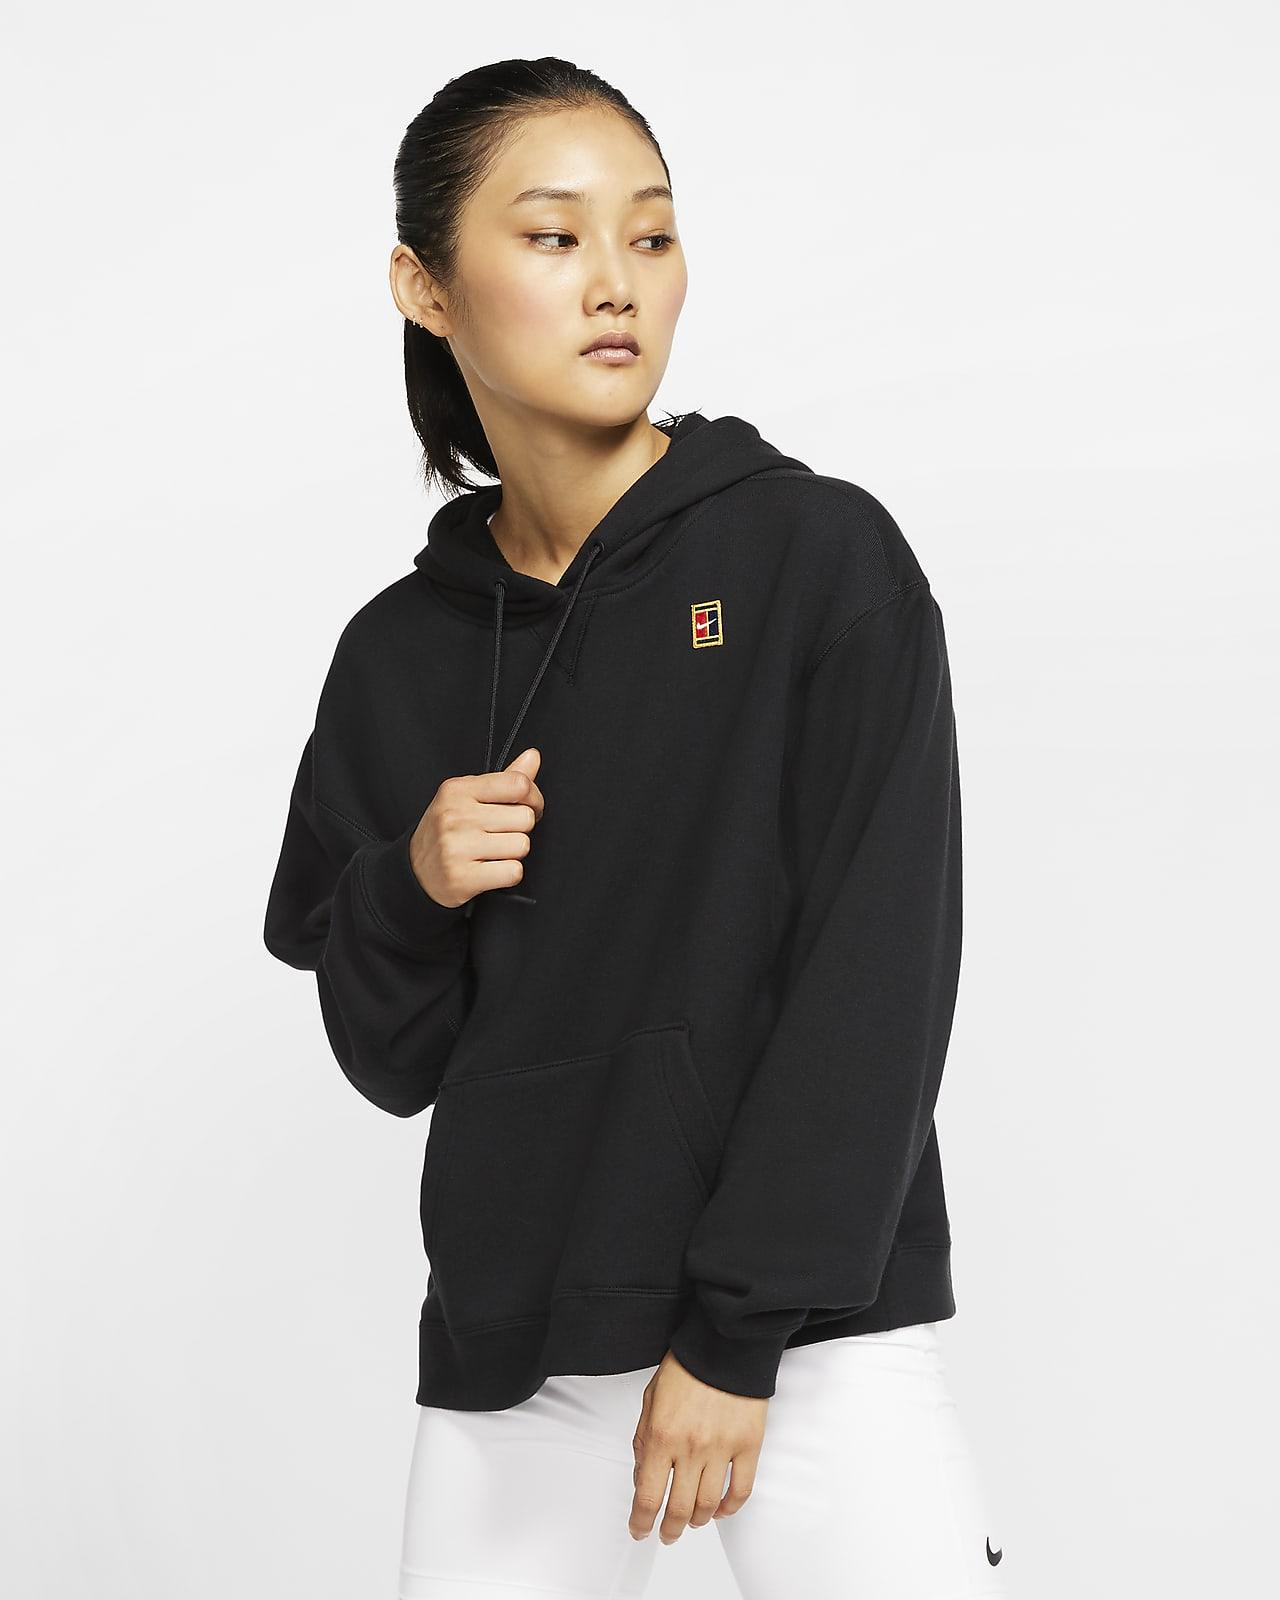 Asco borracho Tratamiento  Sudadera con capucha de tenis para mujer NikeCourt. Nike.com